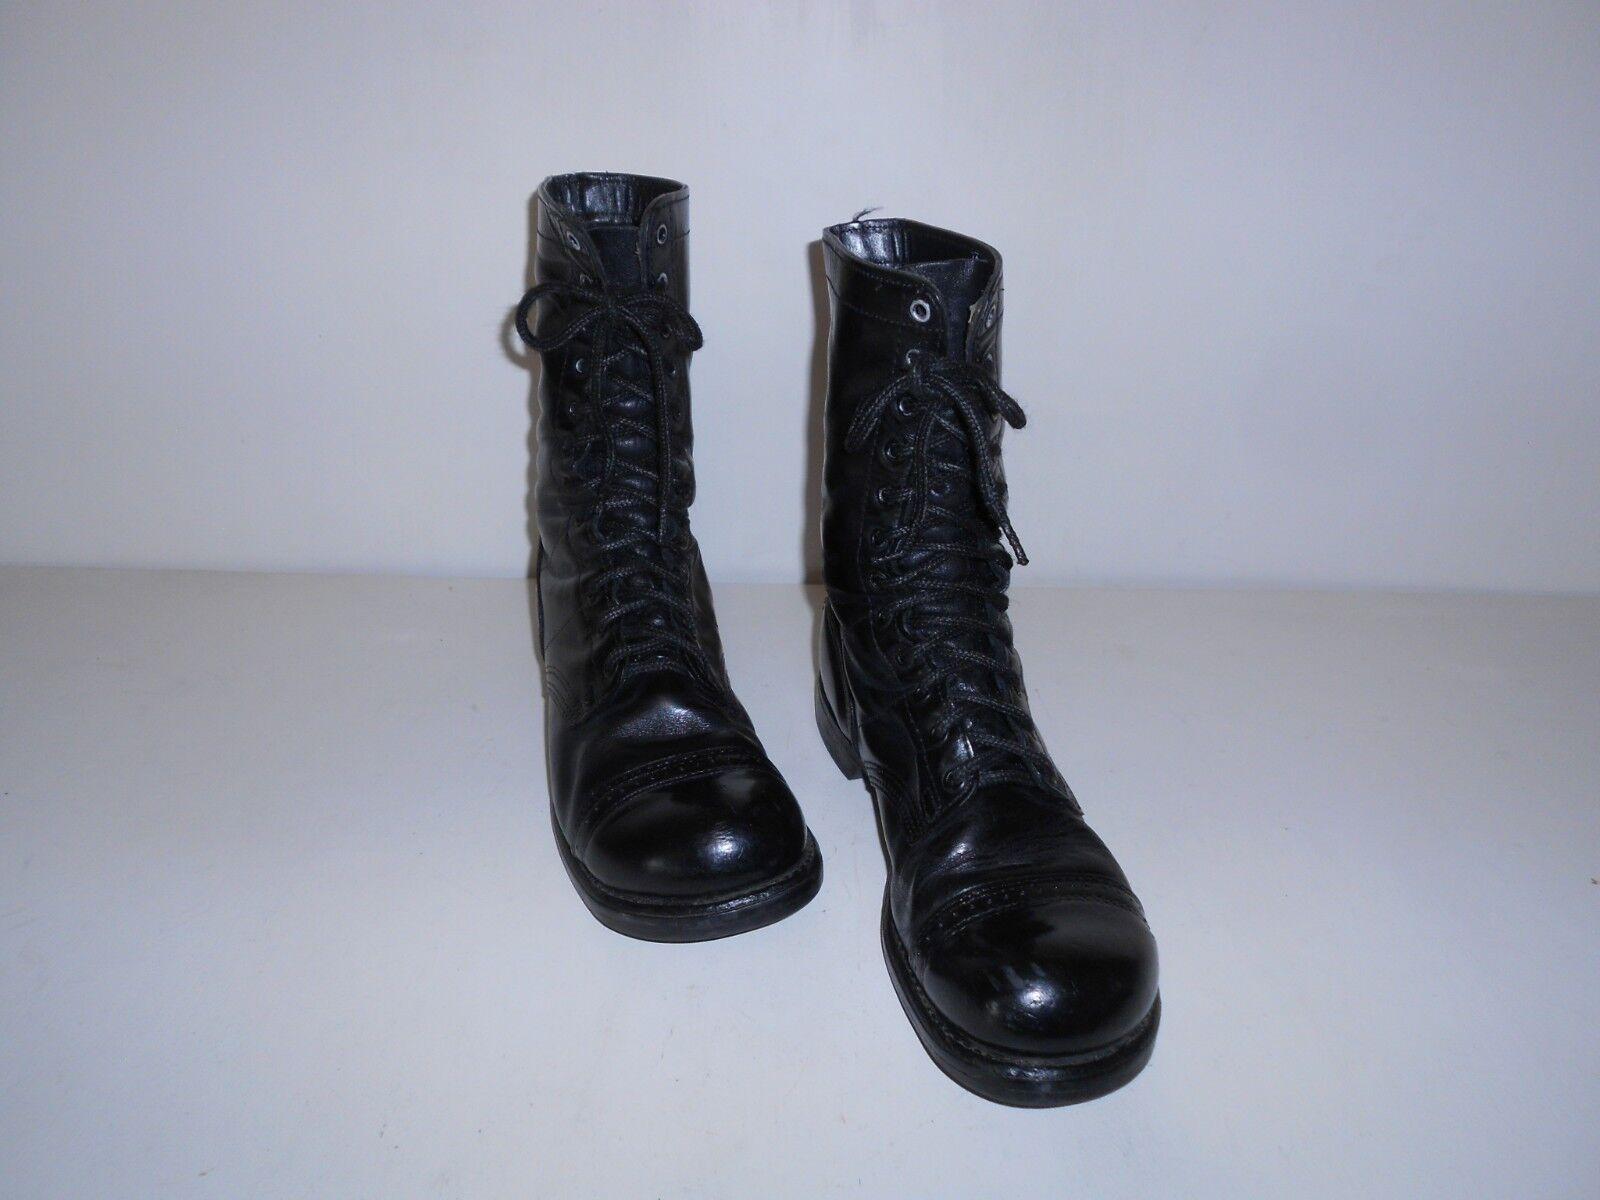 Para Hombre botas paracaidista Corcoran Combate Militar Puntera medio de 10 D